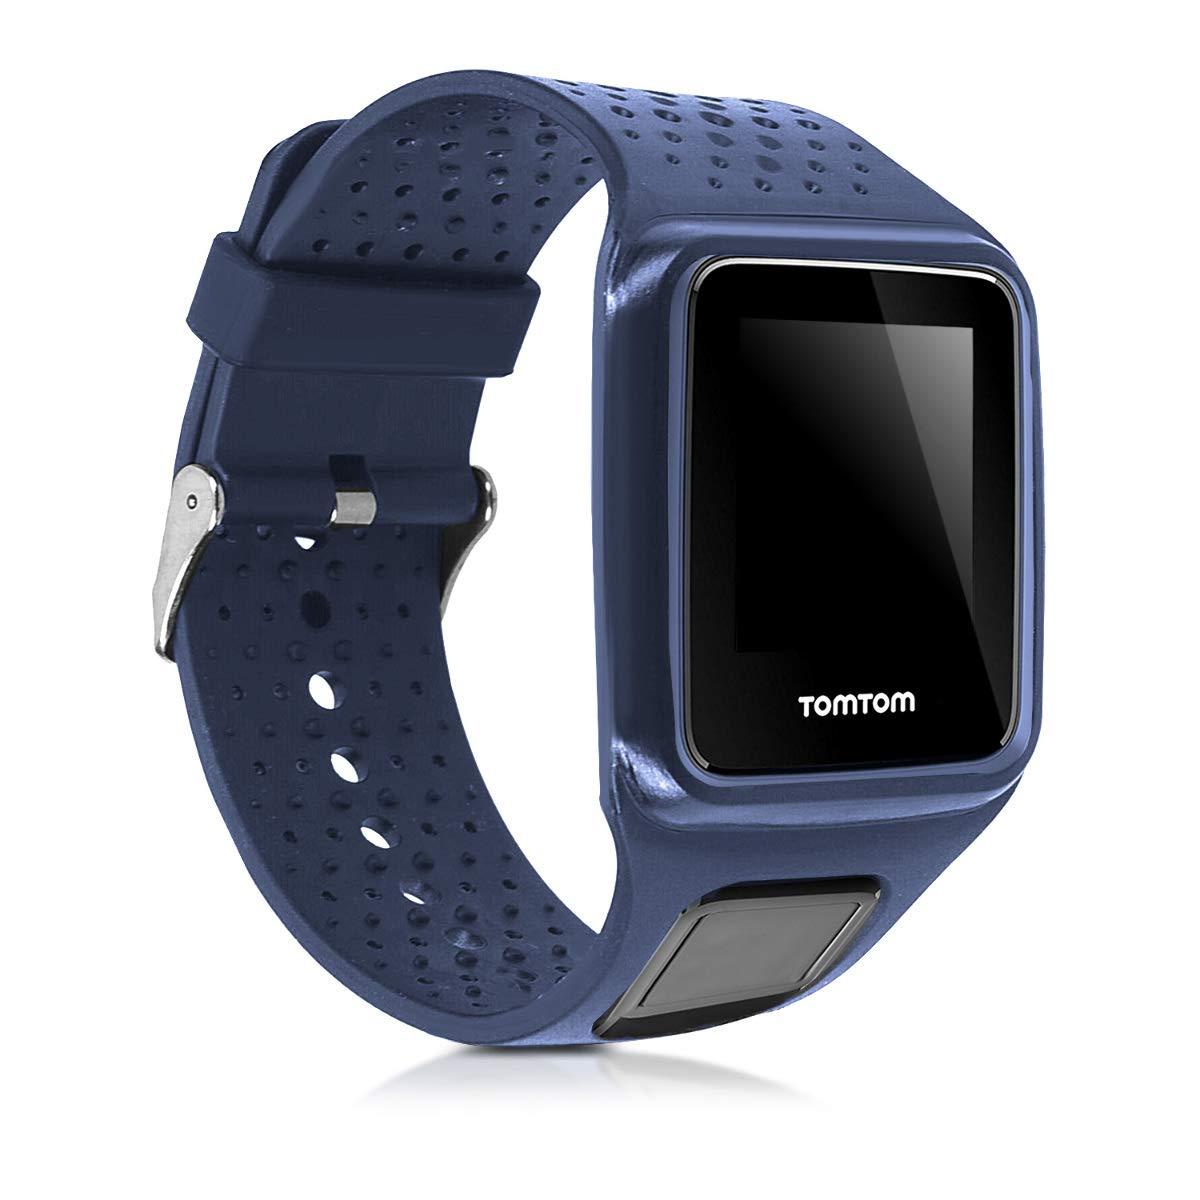 kwmobile Pulsera para Tomtom Runner 1 / Golfer 1 - Brazalete de Silicona en Azul Oscuro sin Fitness Tracker